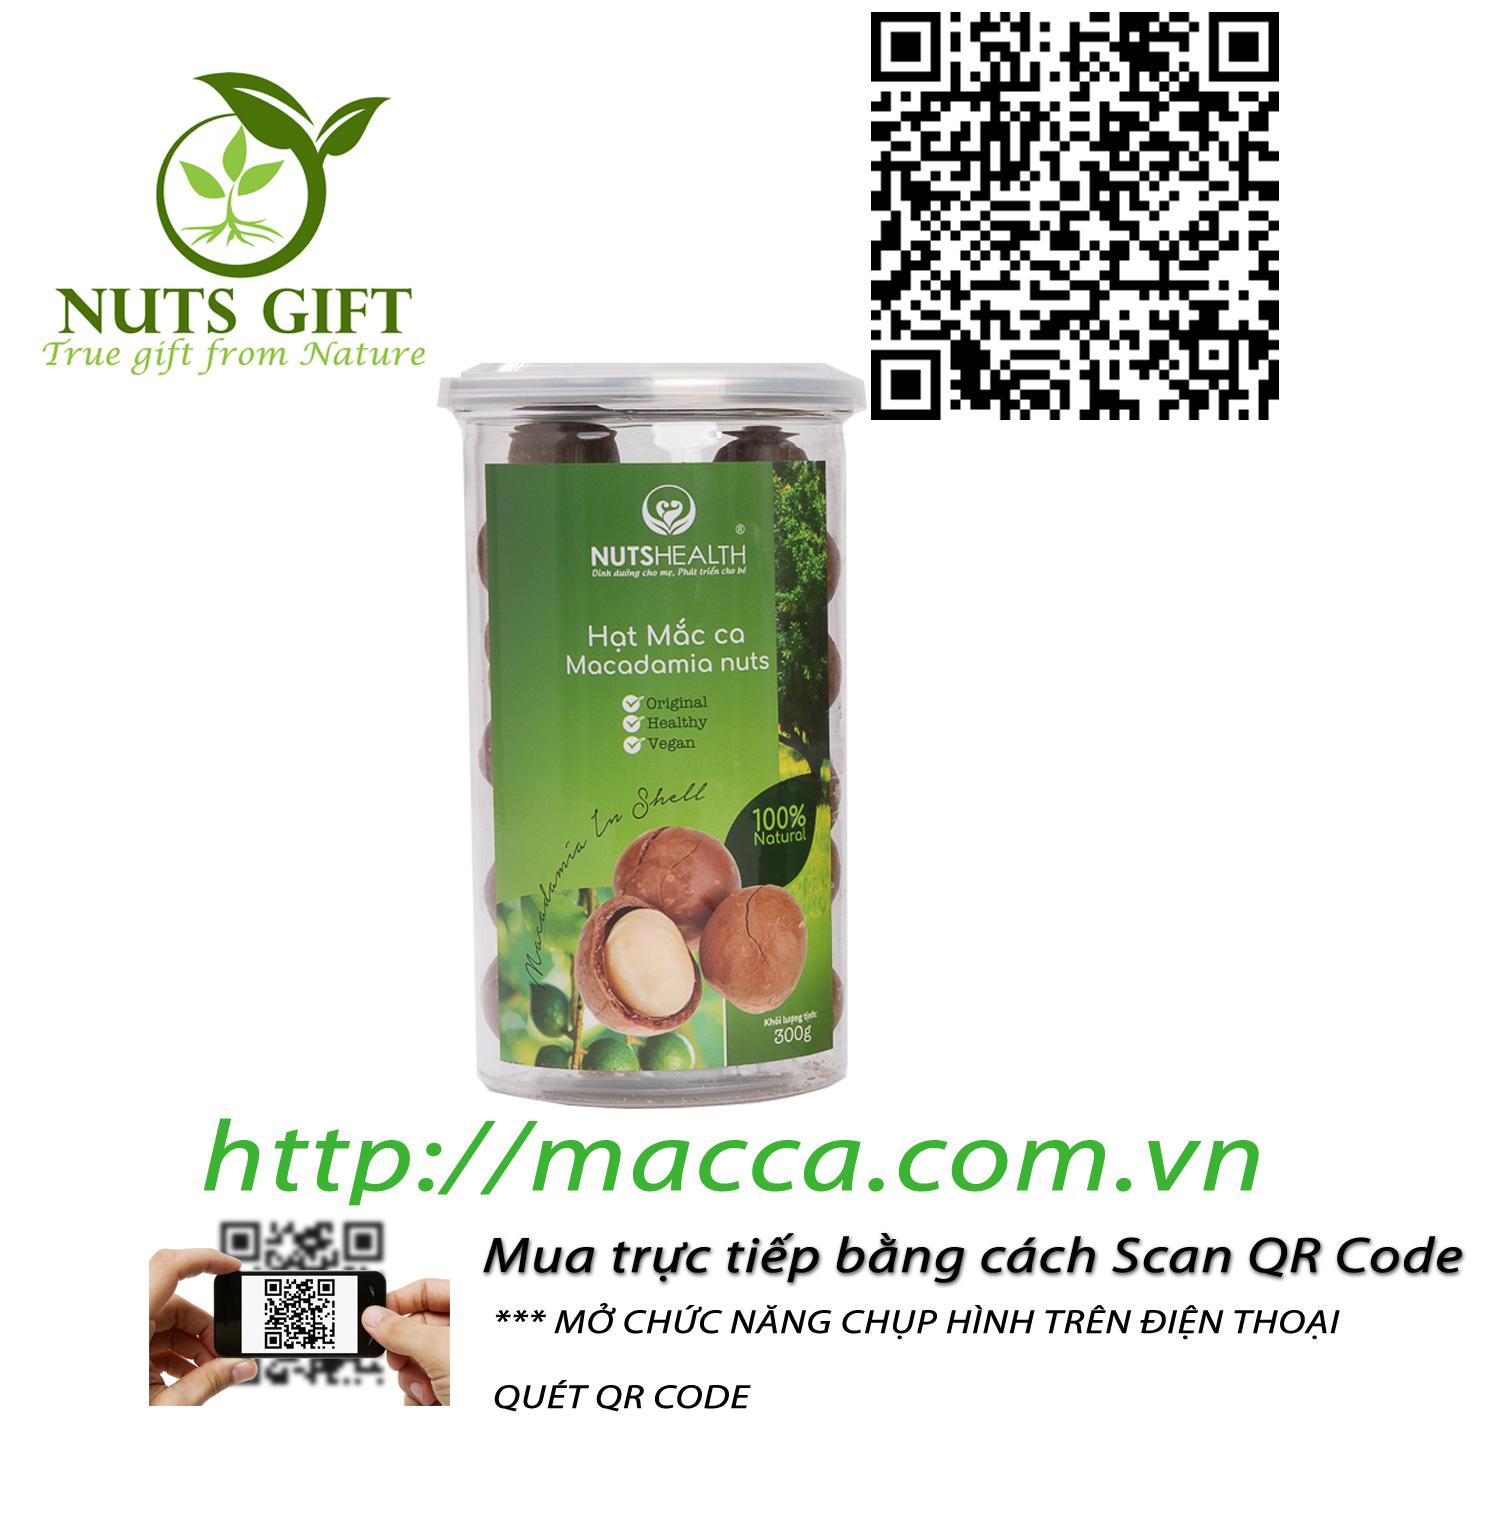 HẠT MẮC CA MACCA ÚC – NUTSHEALTH – 300 GR